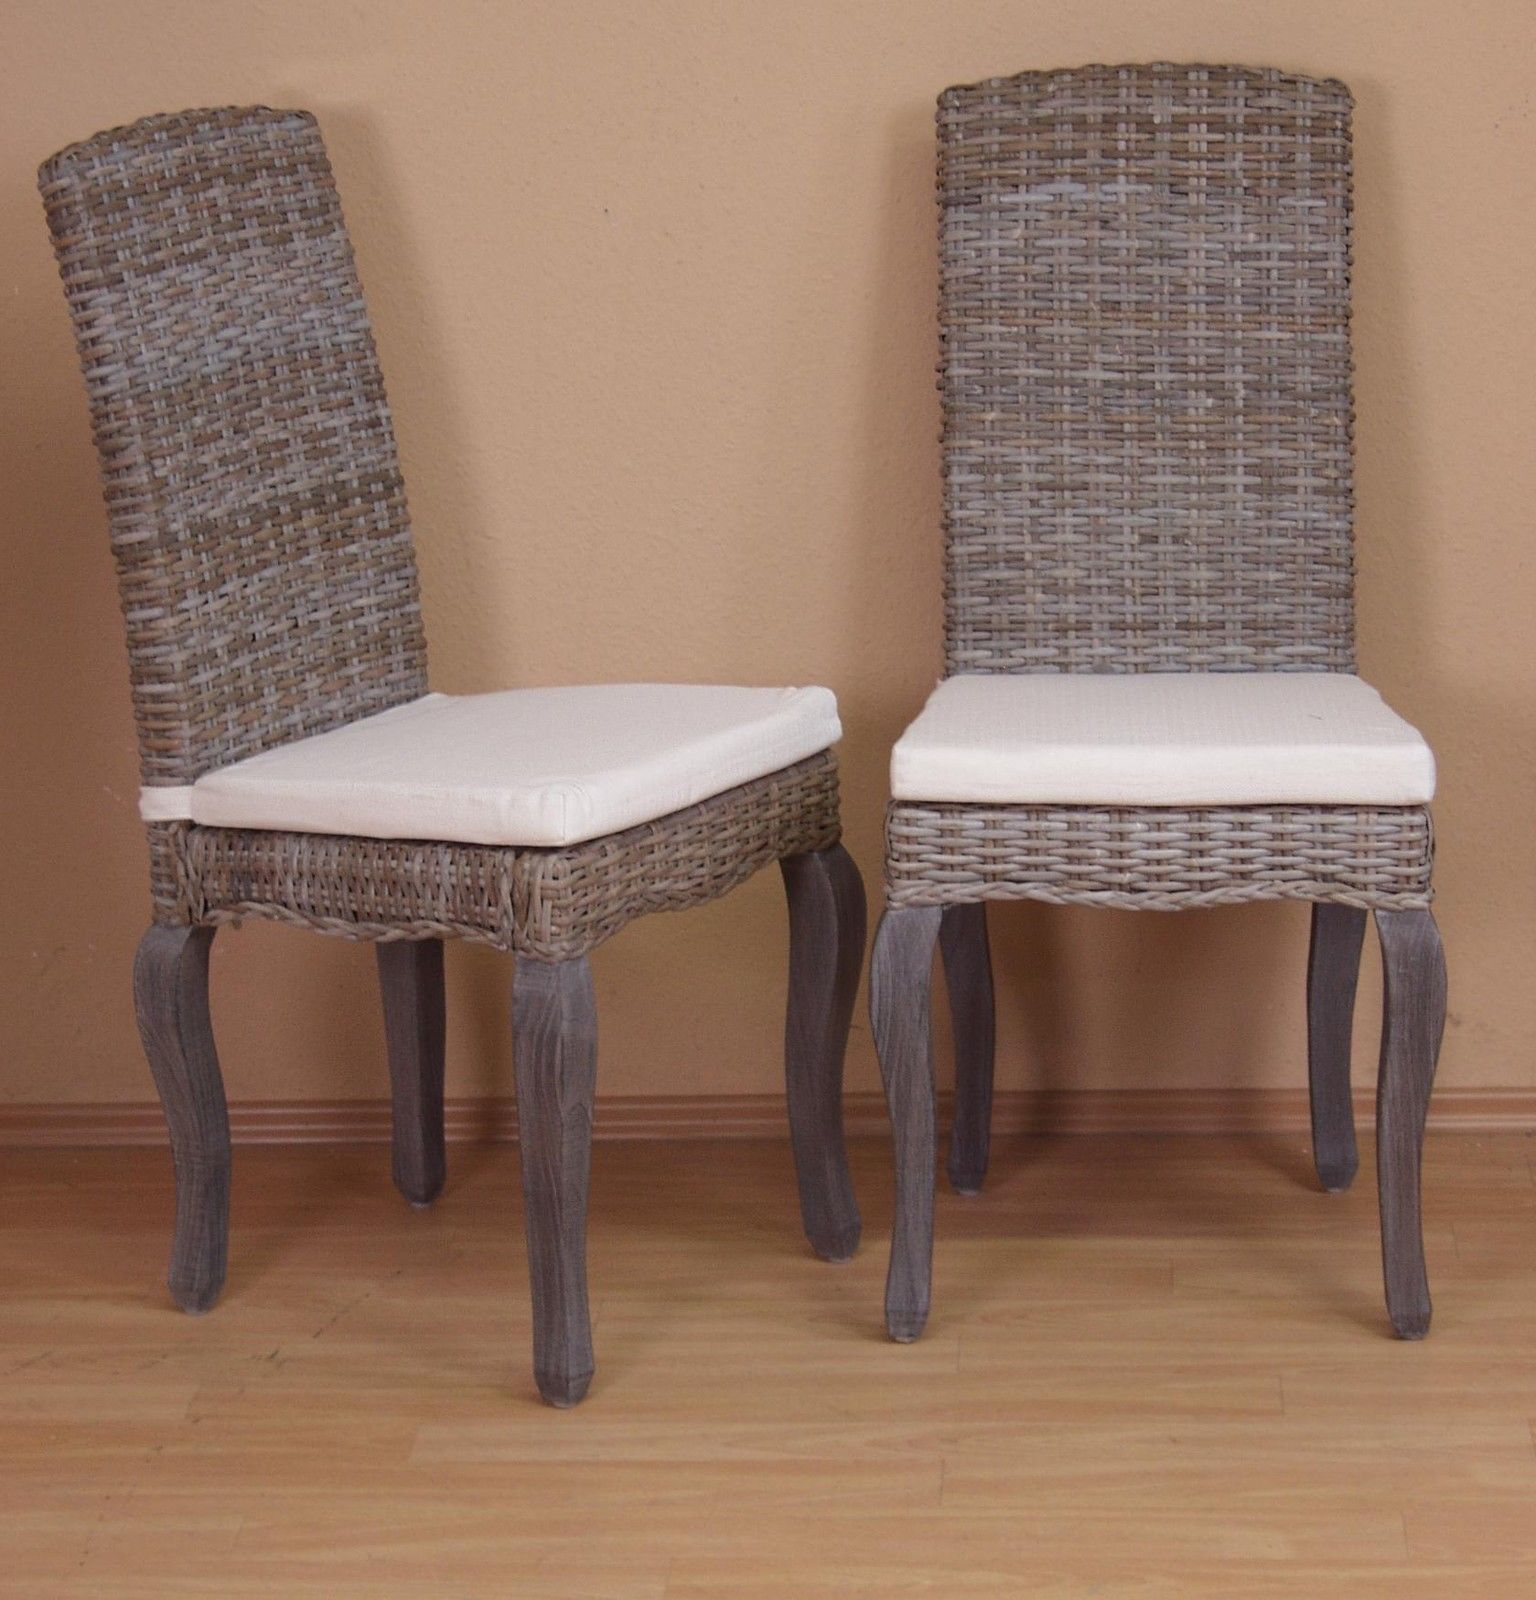 Cool X Massiv Used Look Braun Inkl Kissen Modern Design Stuhlset With Rattanstuhl  Modern